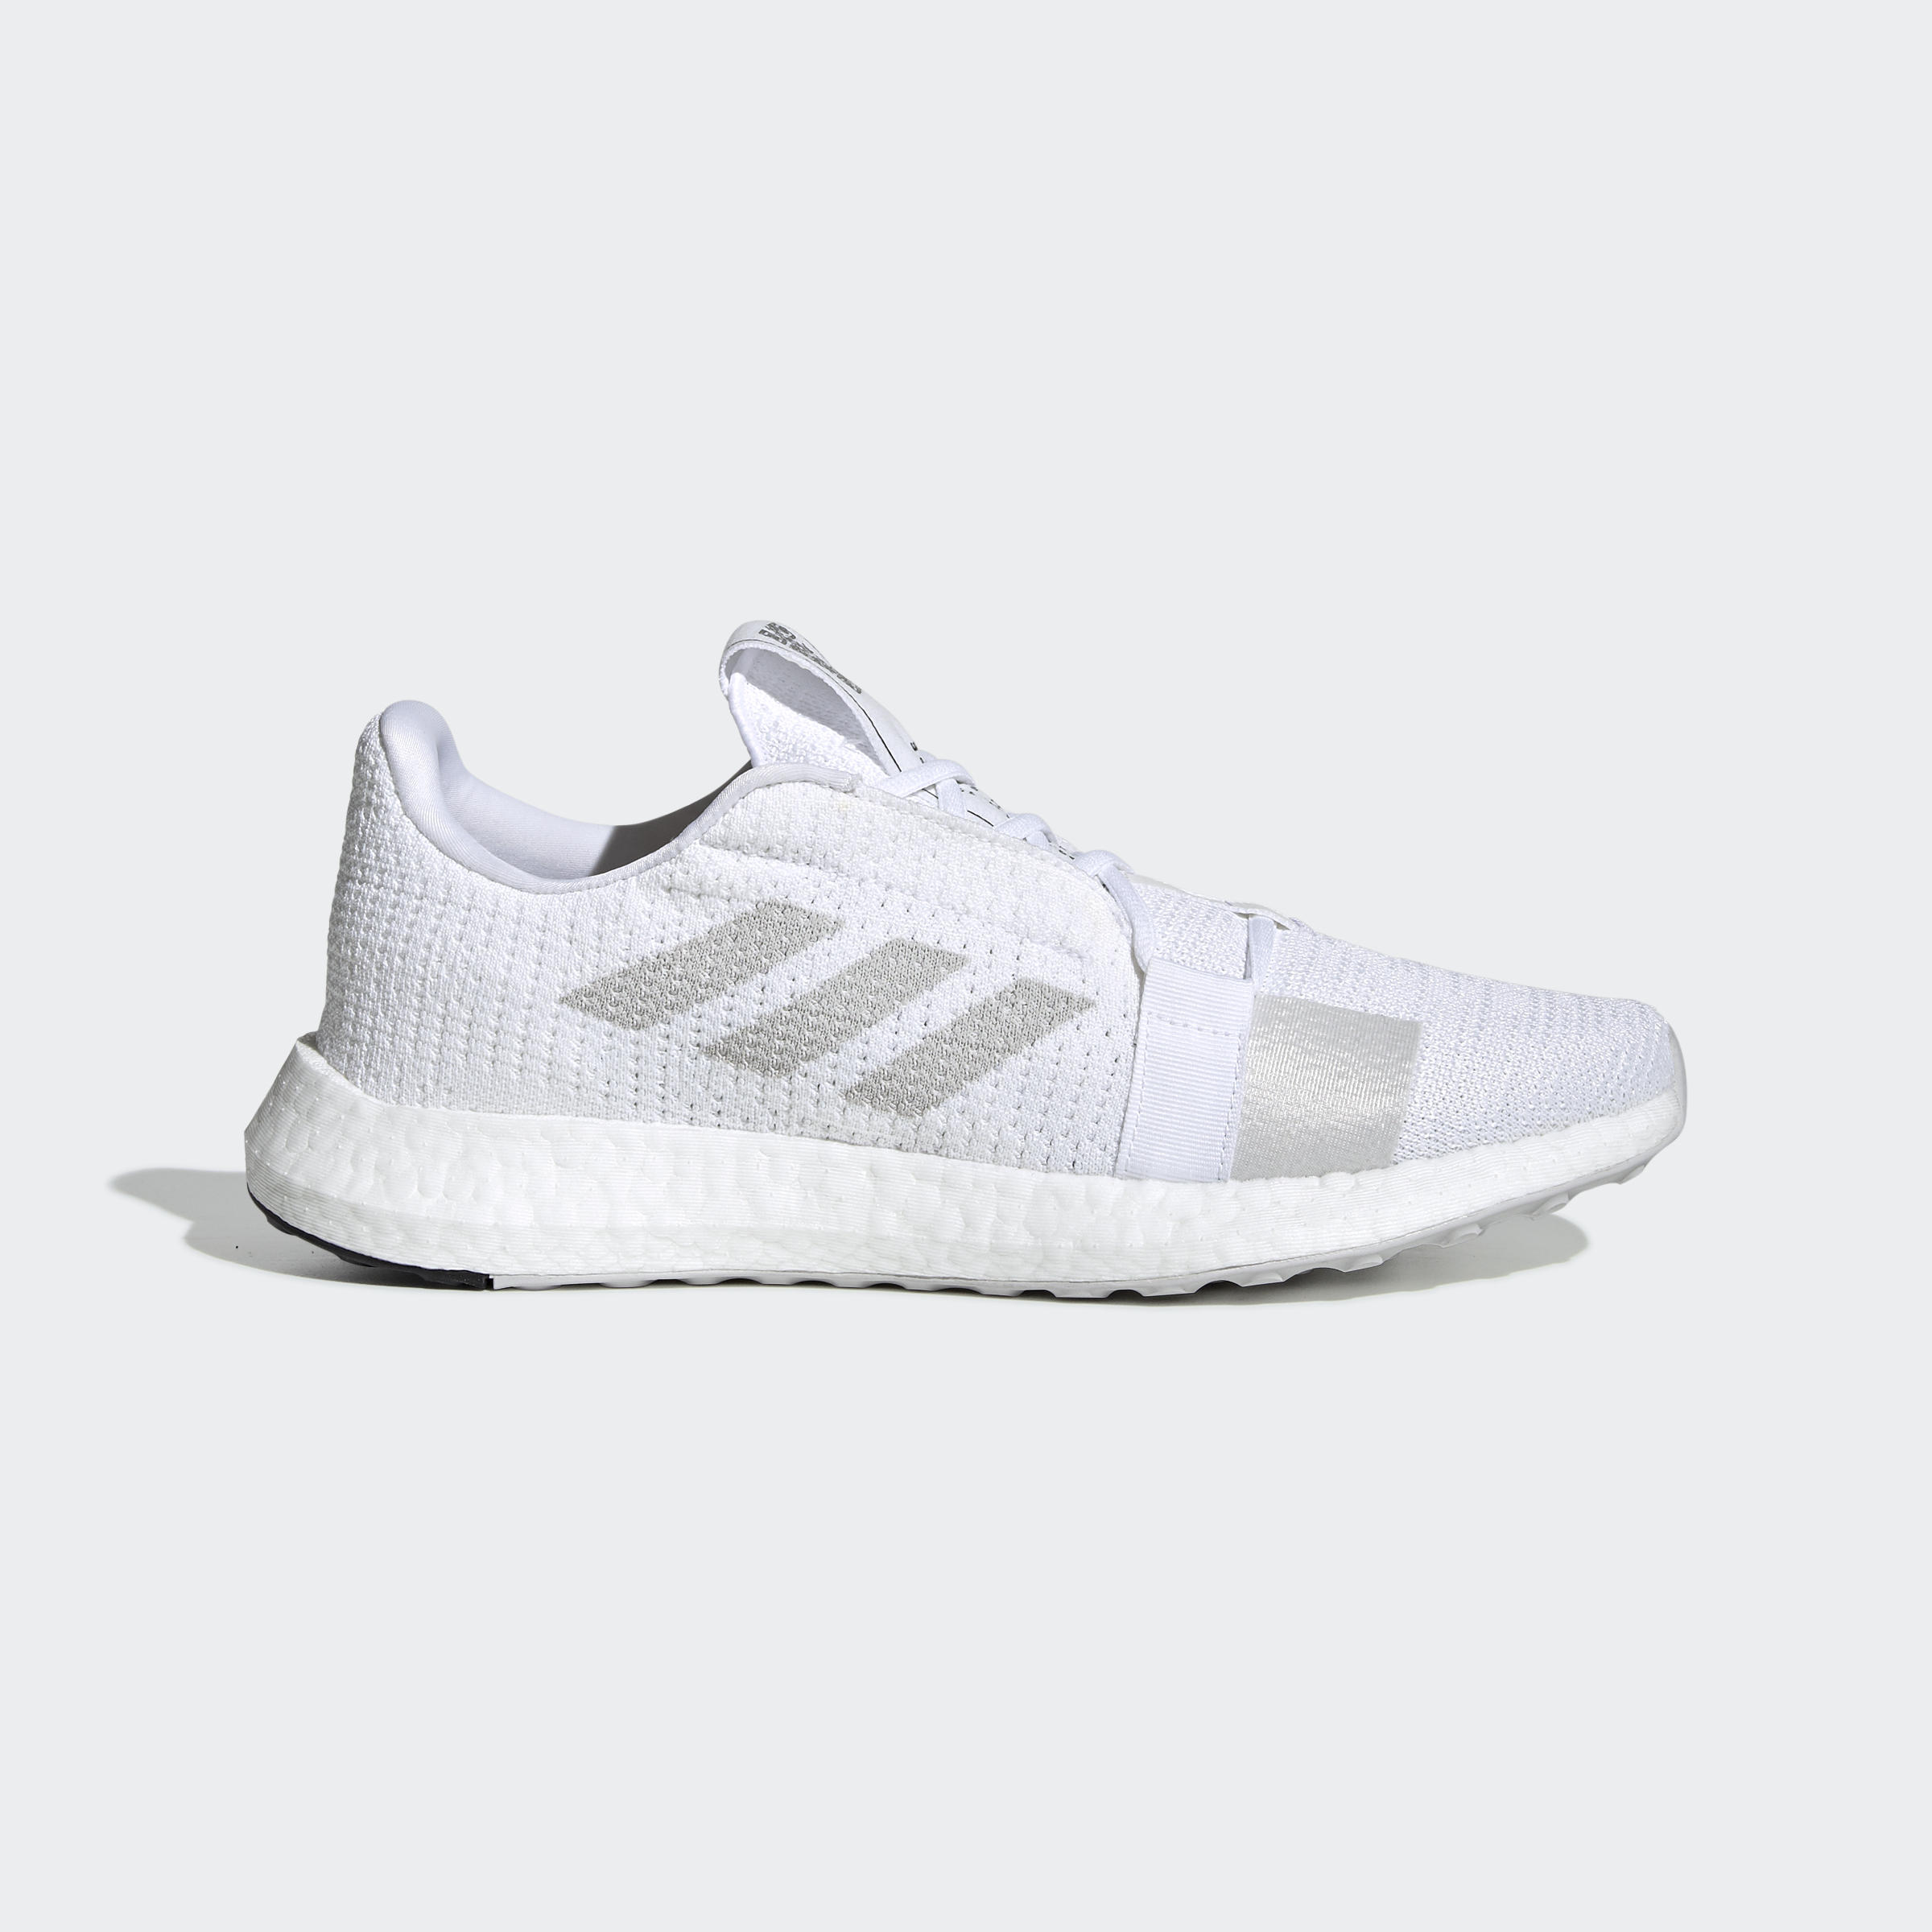 miniature 29 - adidas Senseboost Go Shoes Men's Athletic & Sneakers